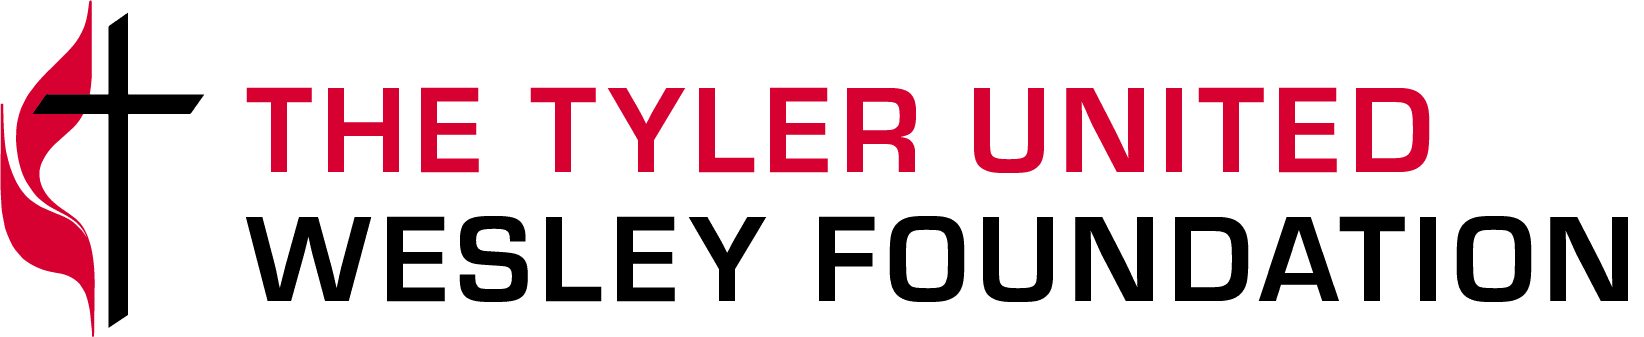 Tyler Wesley Foundation